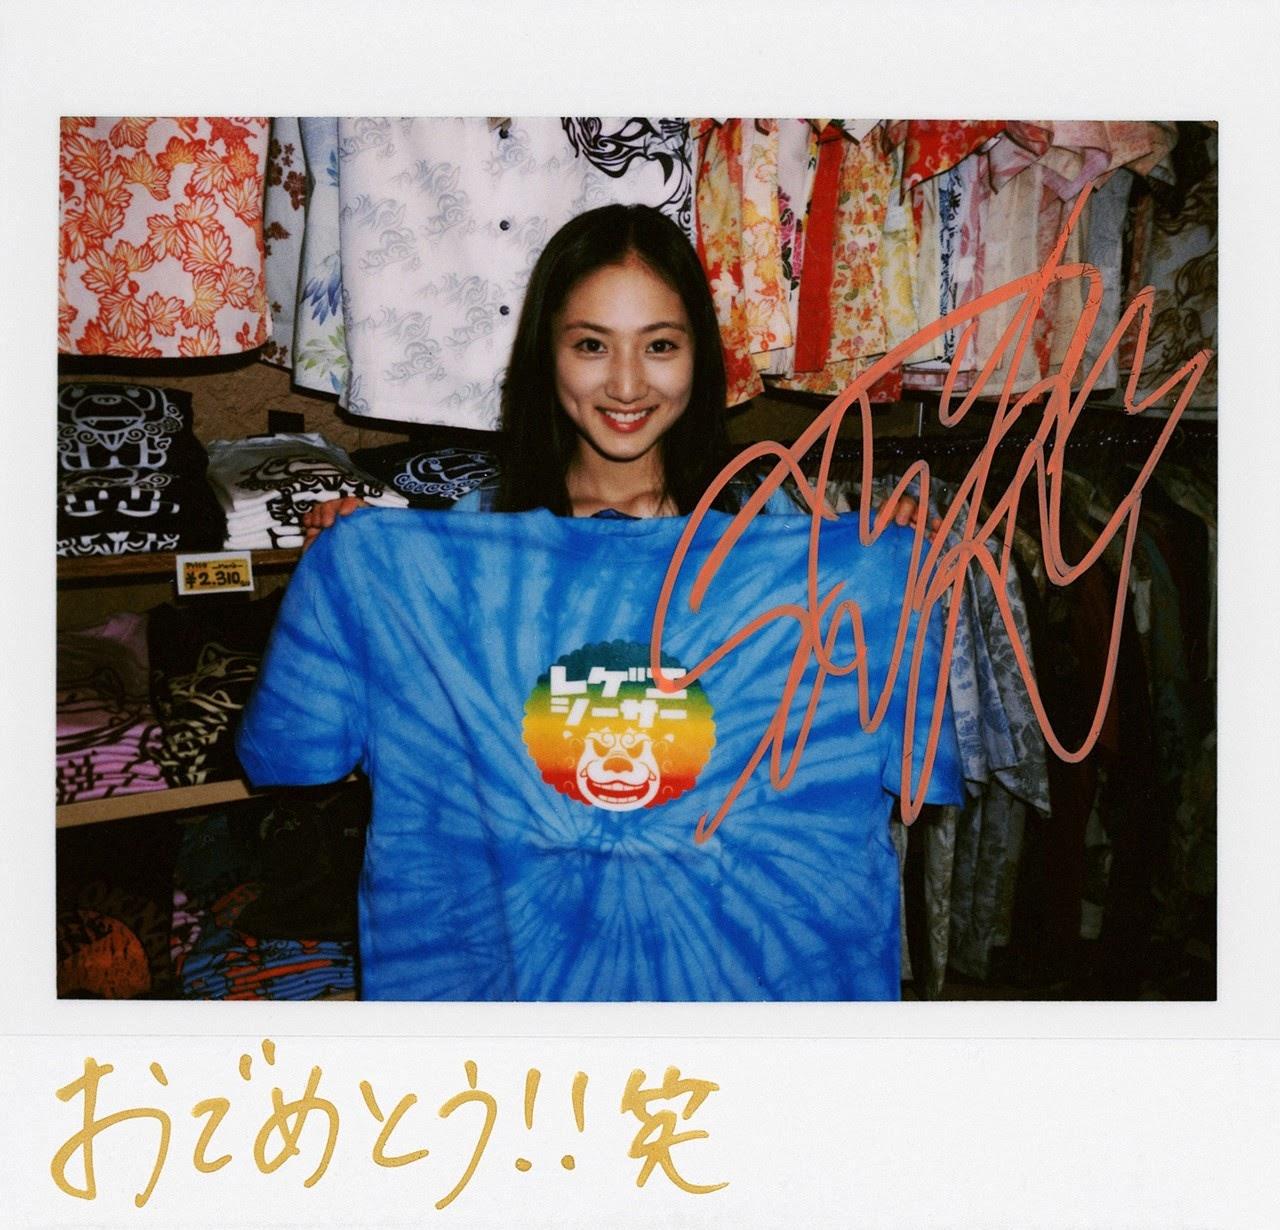 And on Kumejima the first experienceher late summer vacation begins! Saaya163